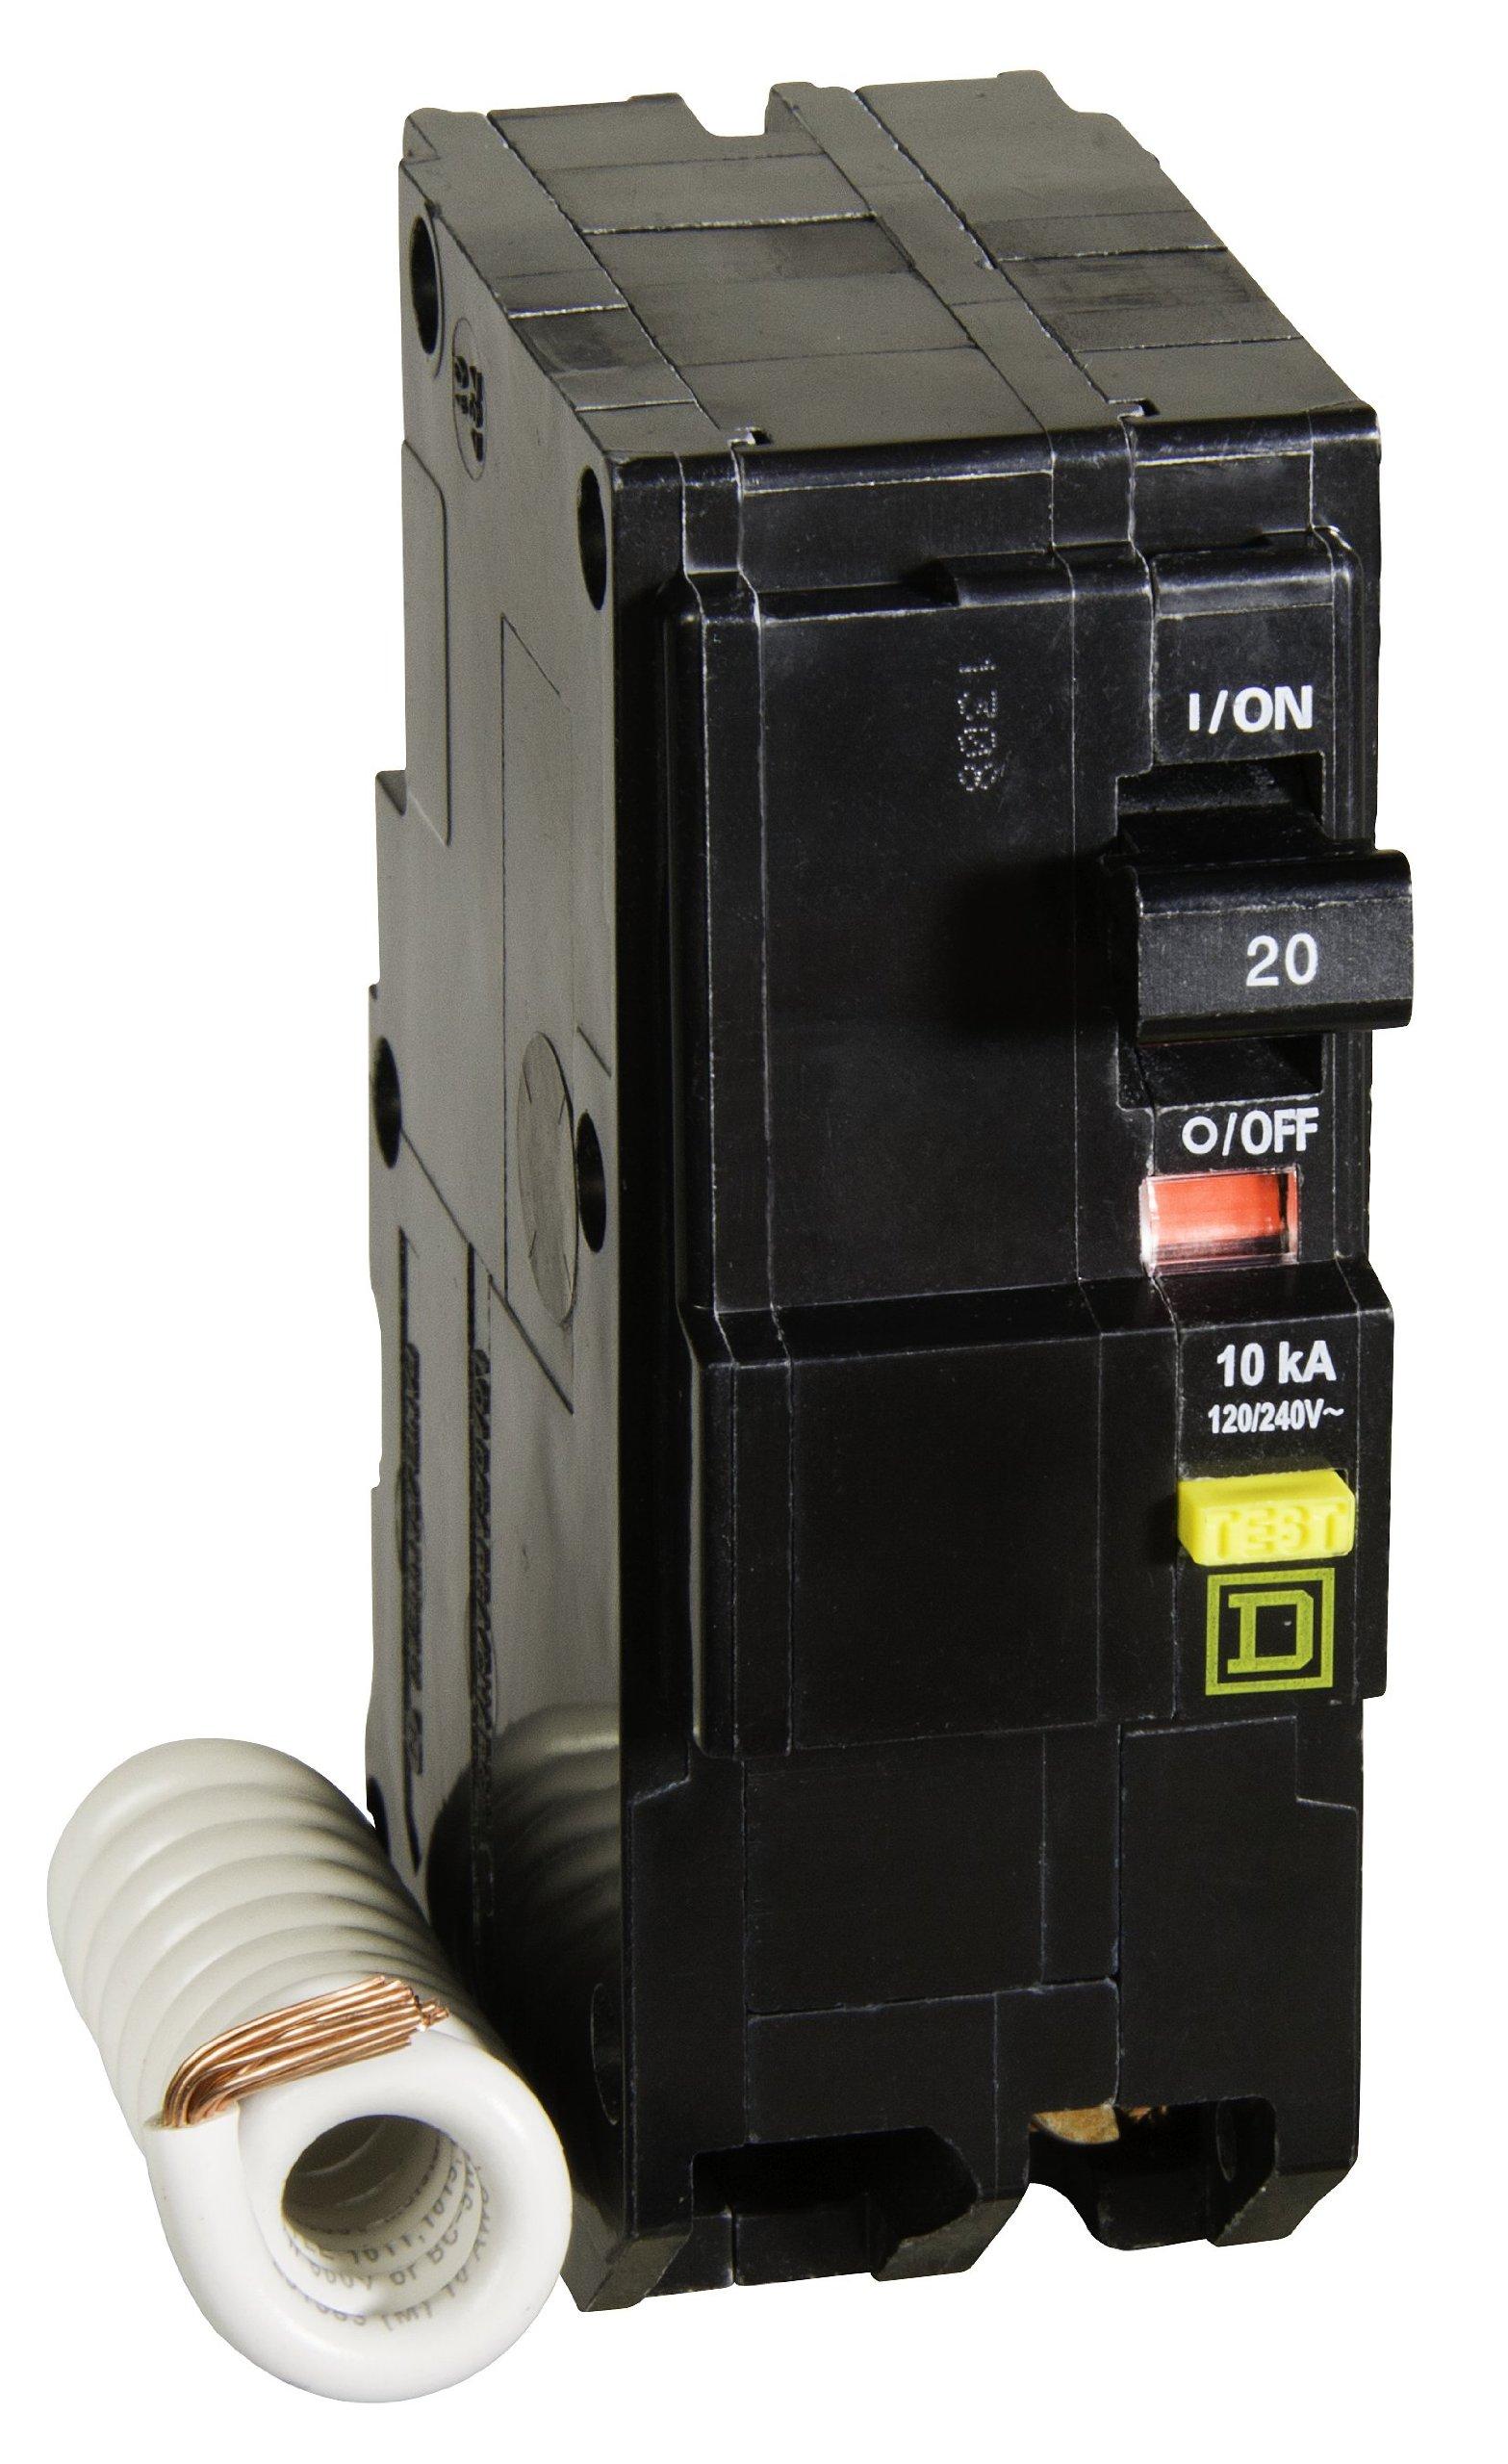 Square D by Schneider Electric QO220GFICP QO Qwik-Gard 20-Amp Two-Pole GFCI Breaker